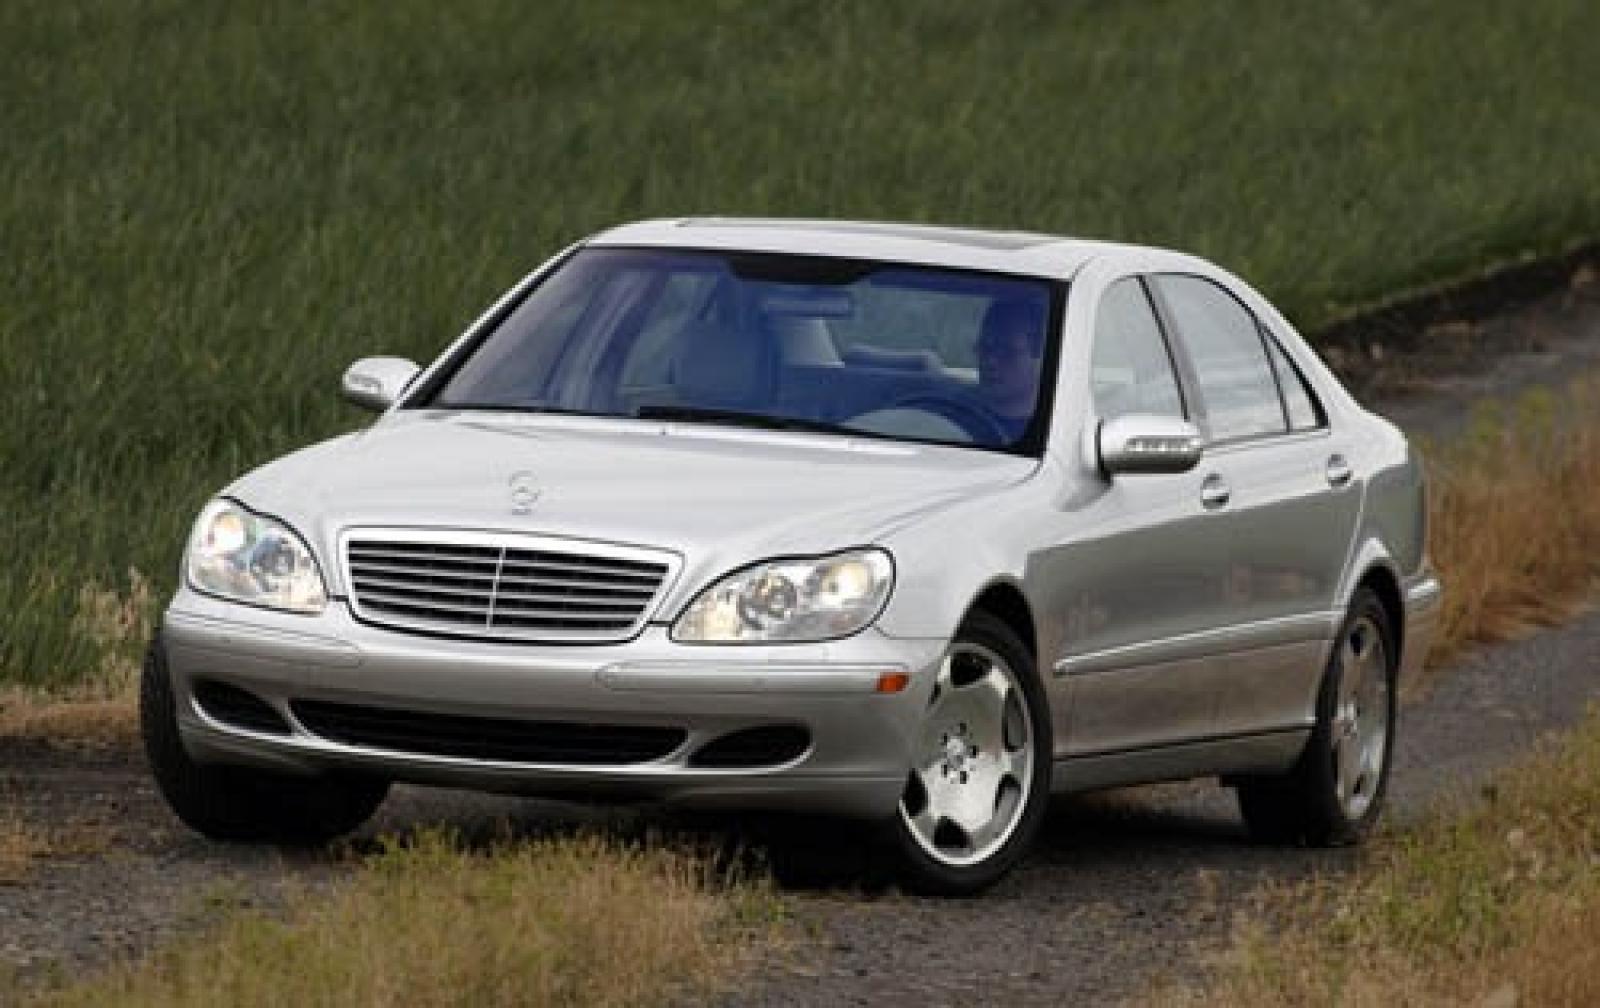 2005 mercedes benz s class information and photos for Mercedes benz s class 600